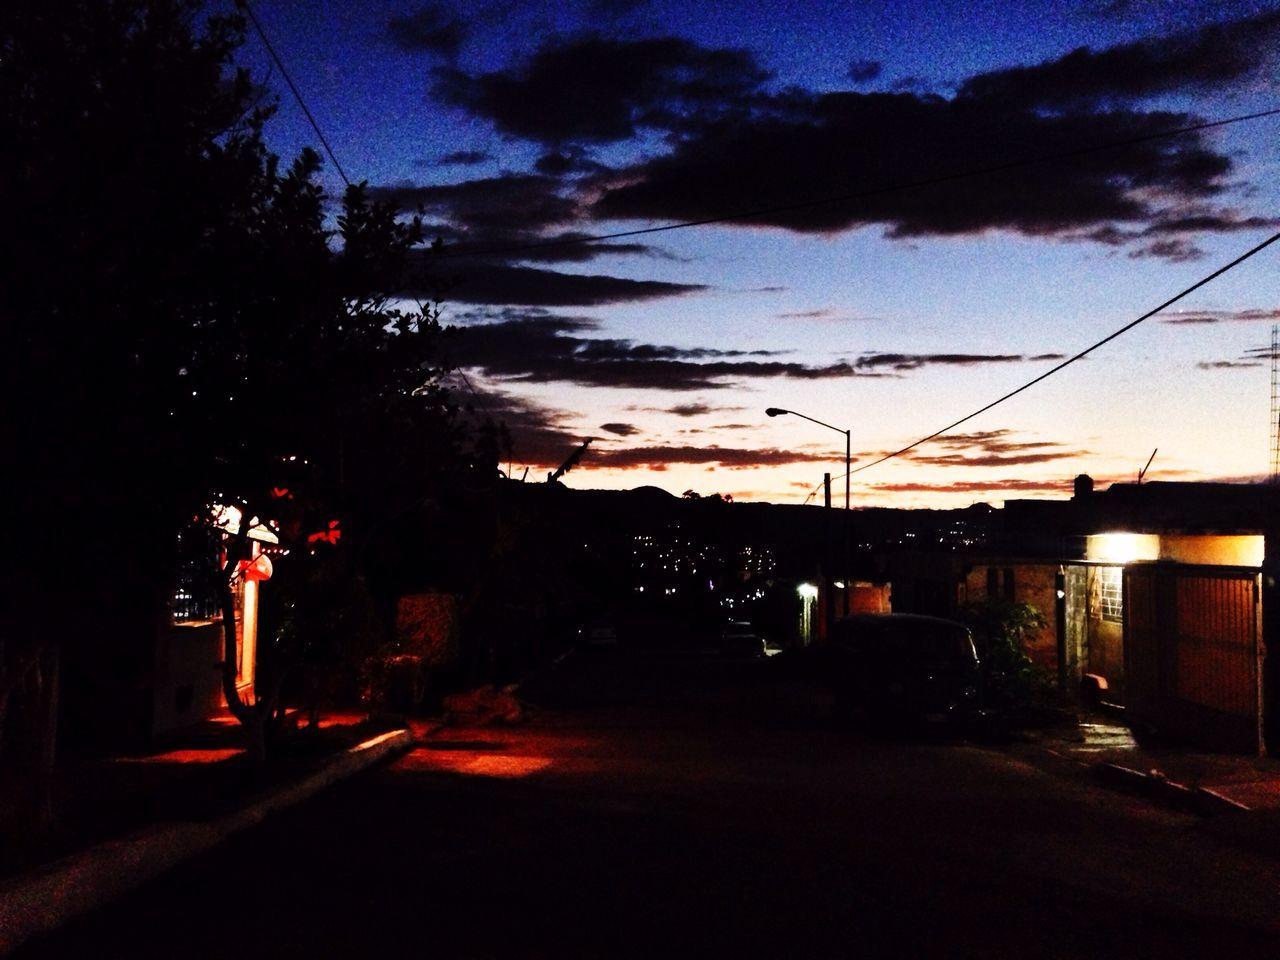 Cae la noche en enero... Streetphotography IPhoneography Urban@ndante